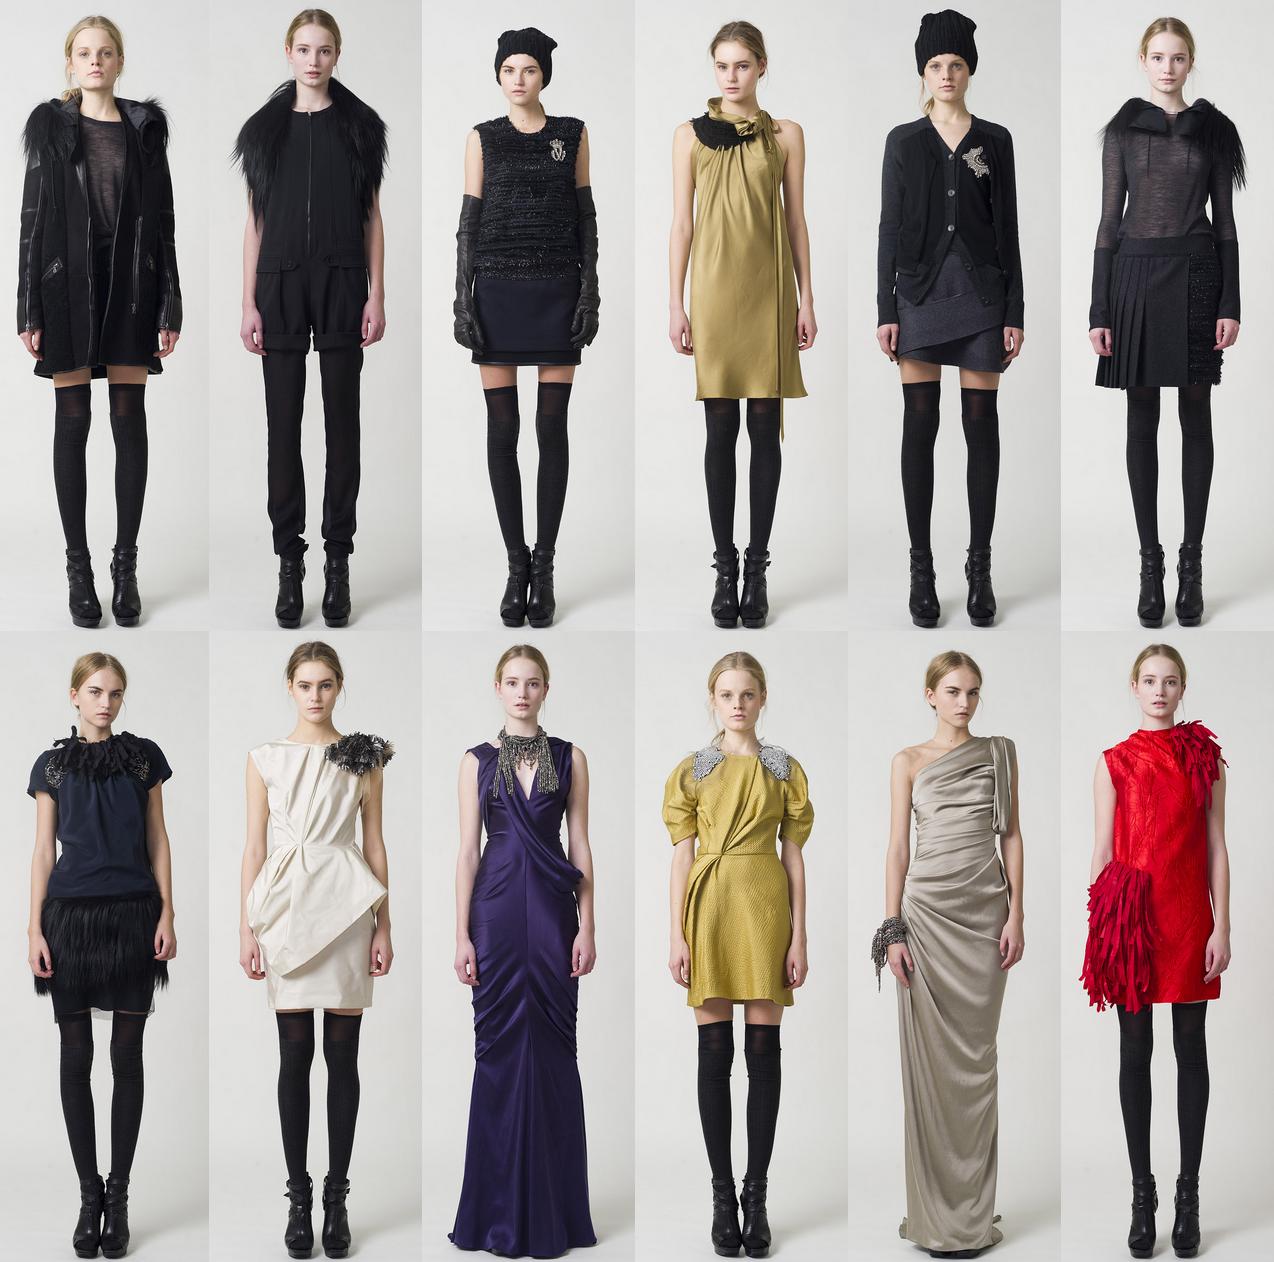 modern fashion   ... of modern fashion   Top clothing brands ...